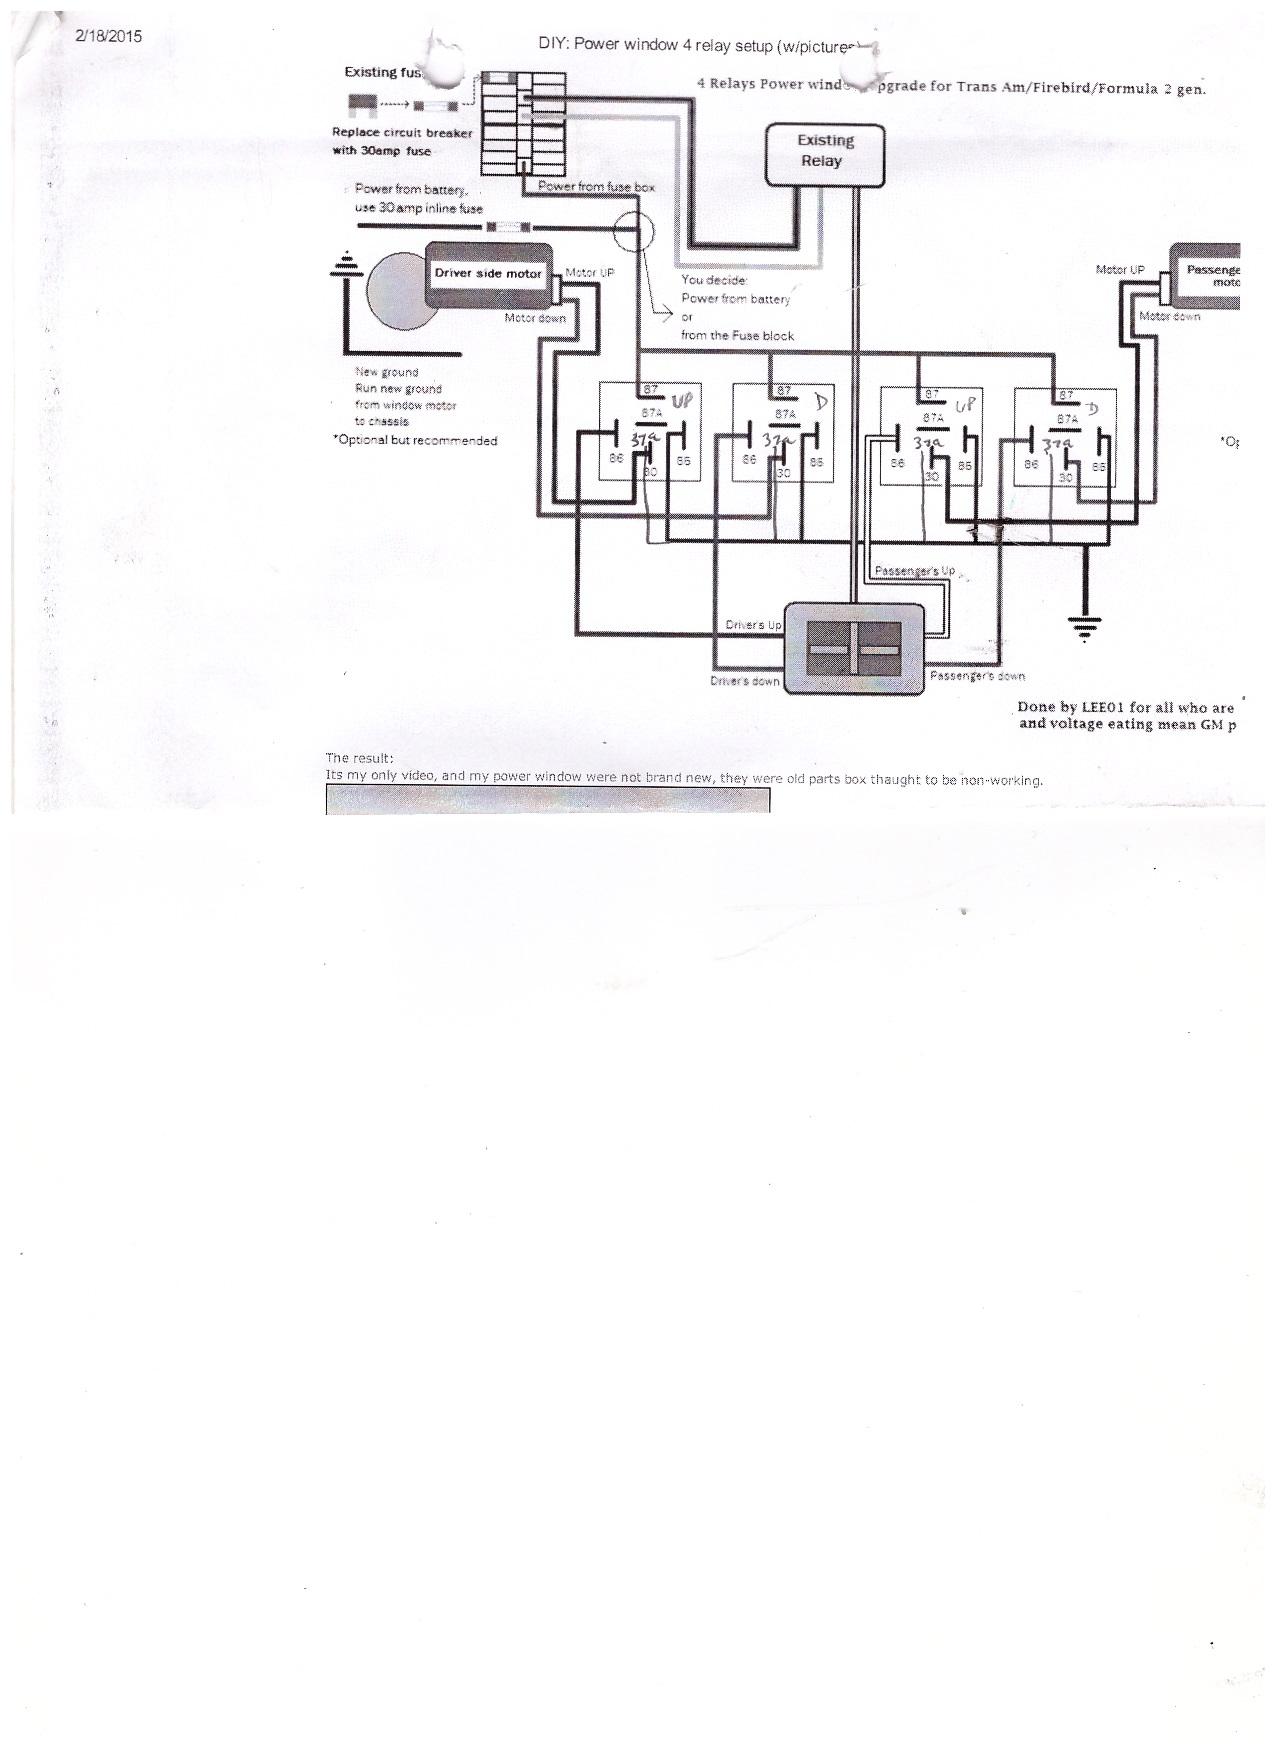 power window relay setup electronics forum (circuits, projects Power Window Remote Control diy power window wiring diagram